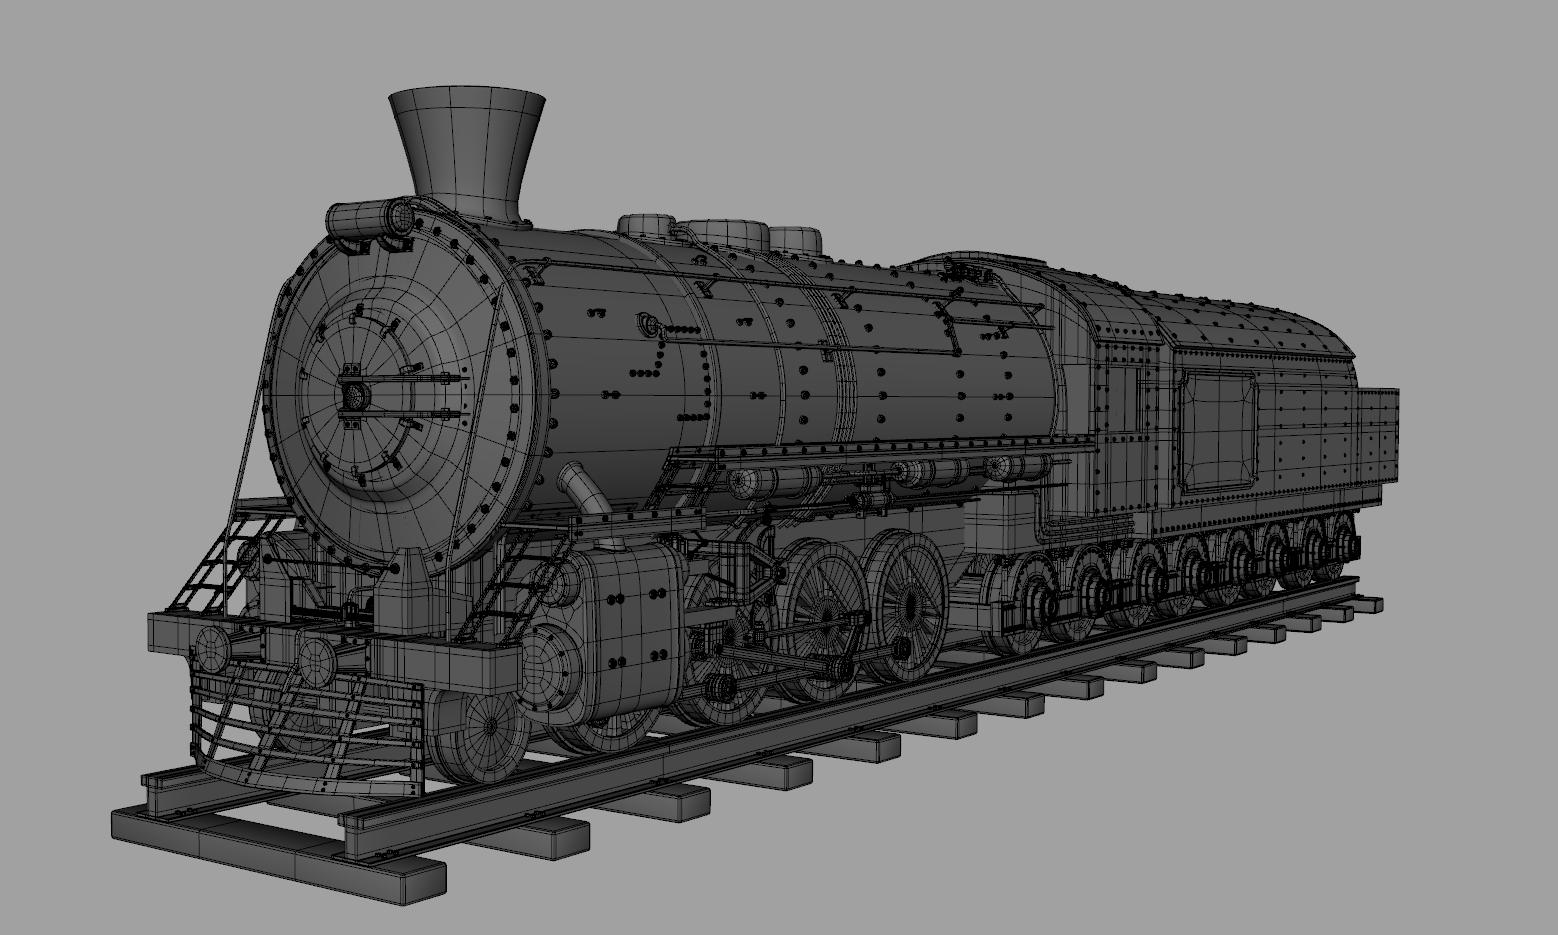 train engine 3d model obj 129030